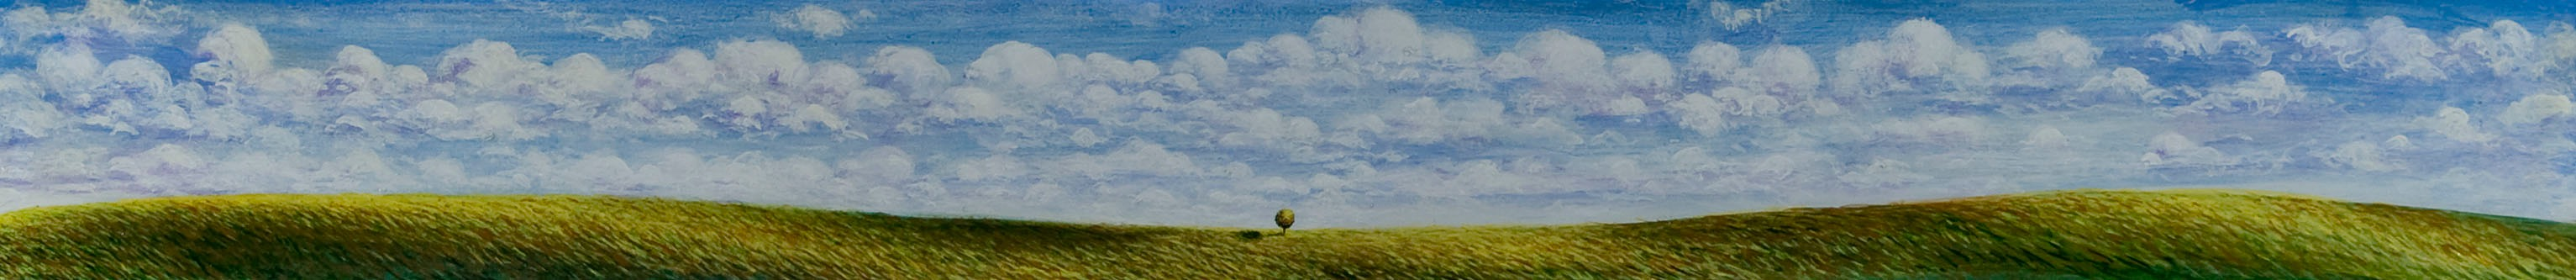 Copy of single tree horizon II